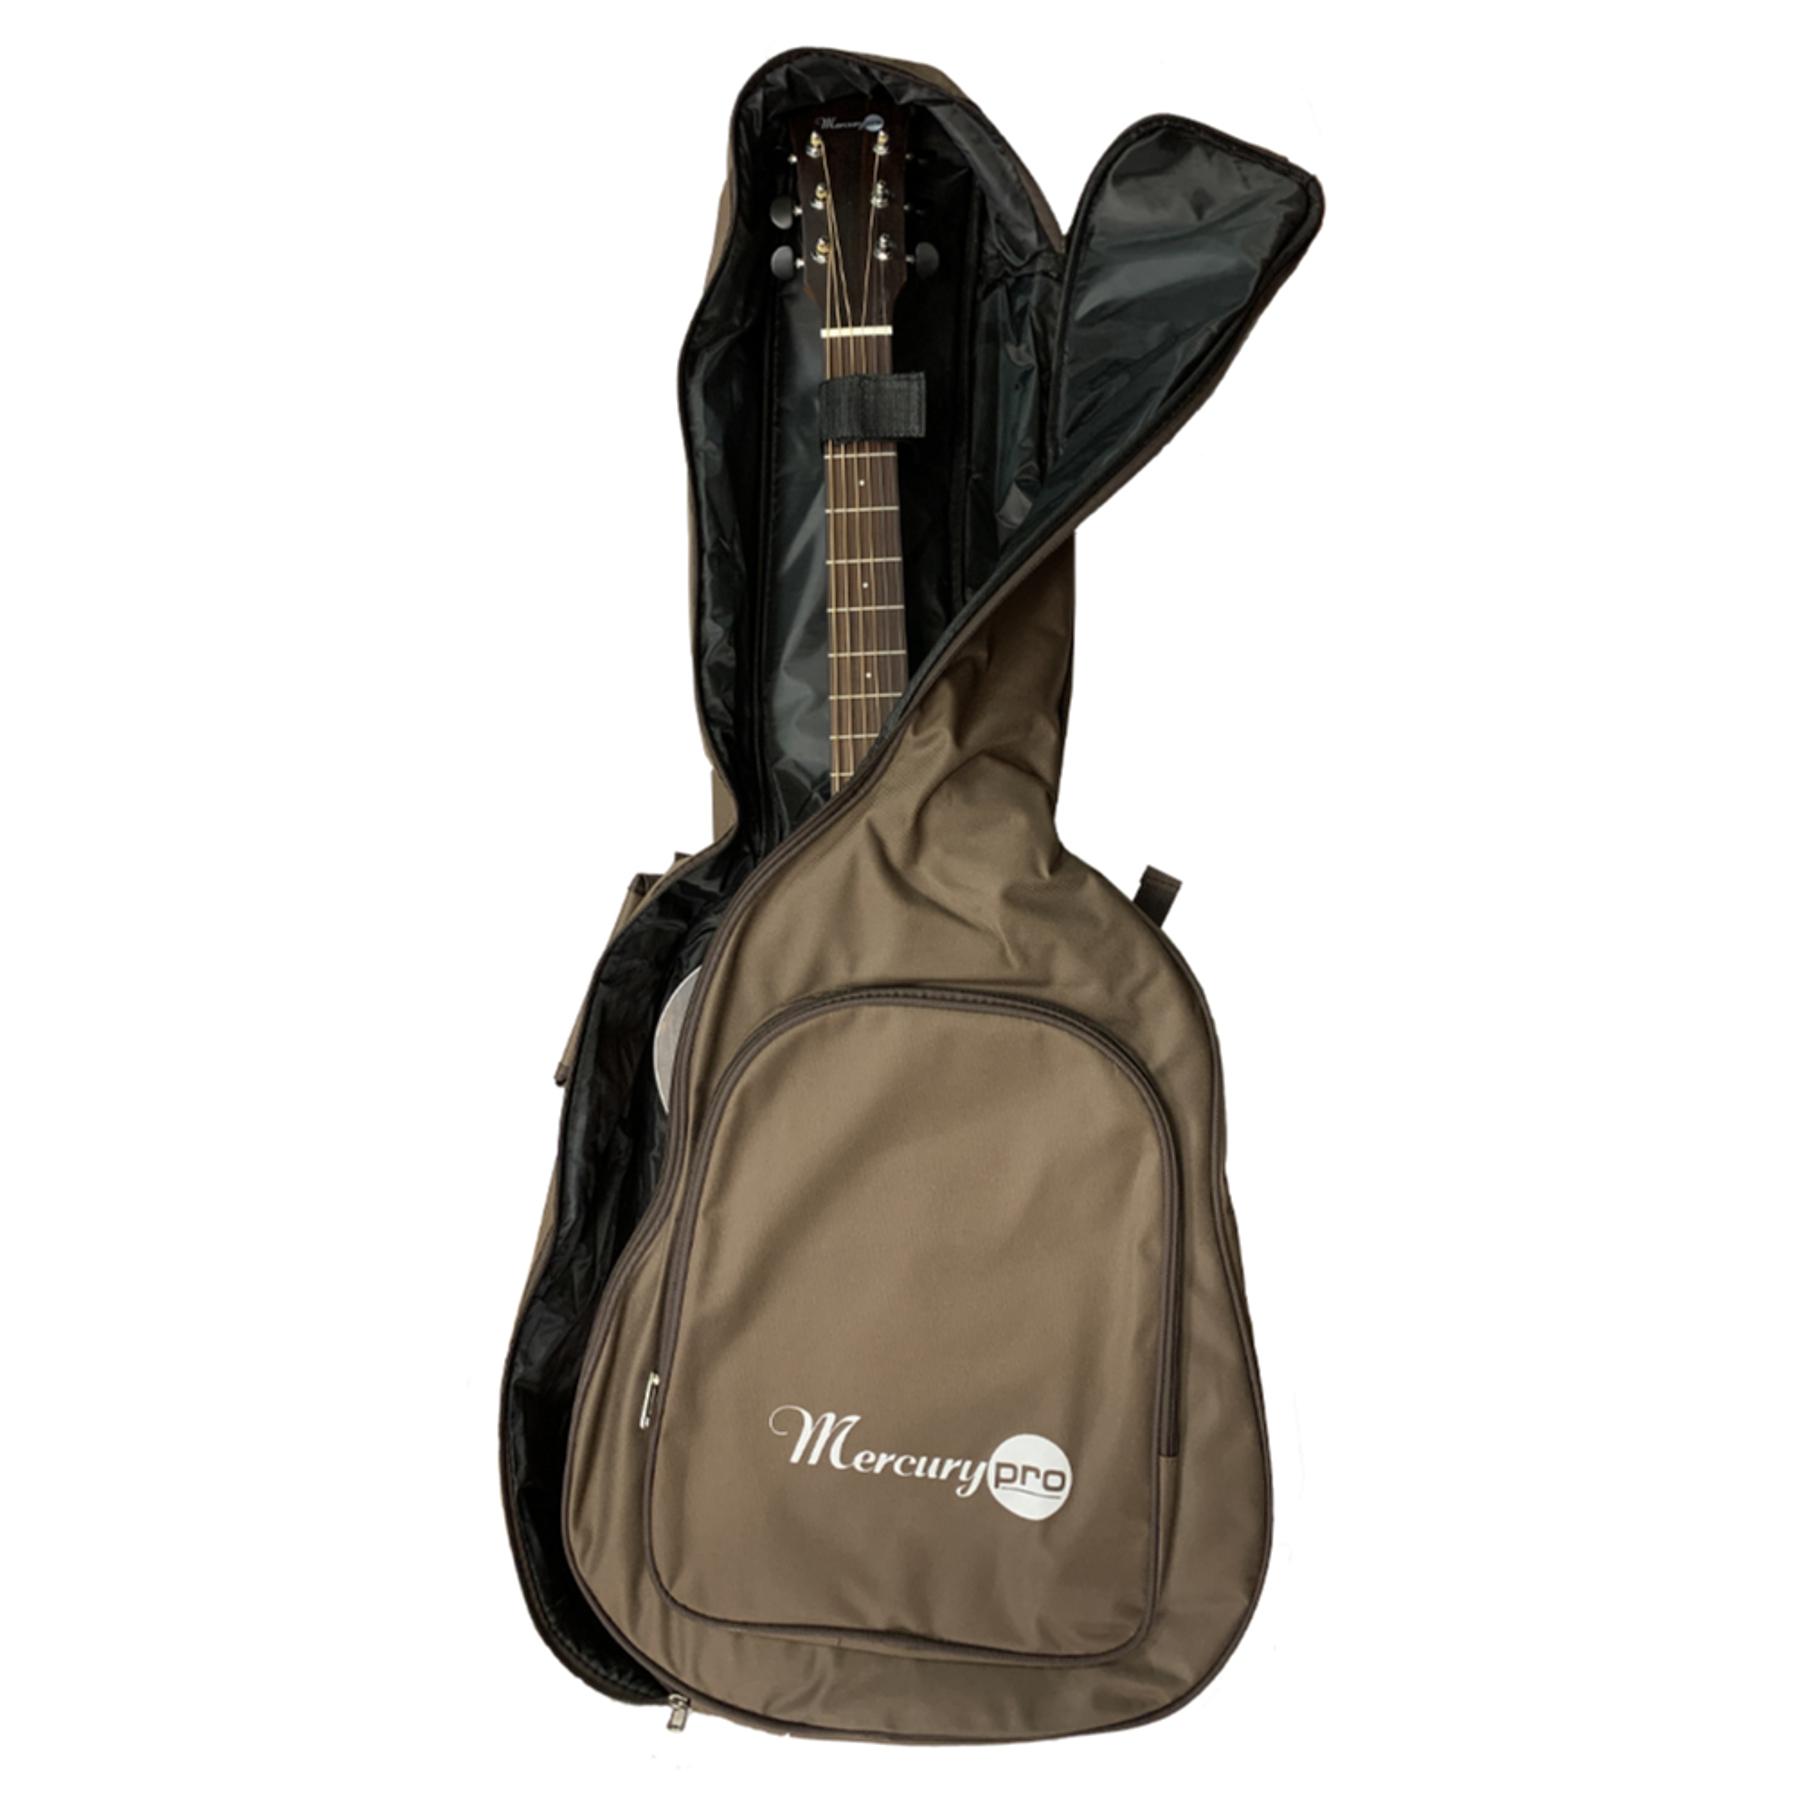 Guitarra Electroacustica MPG02 Spruce Mercury